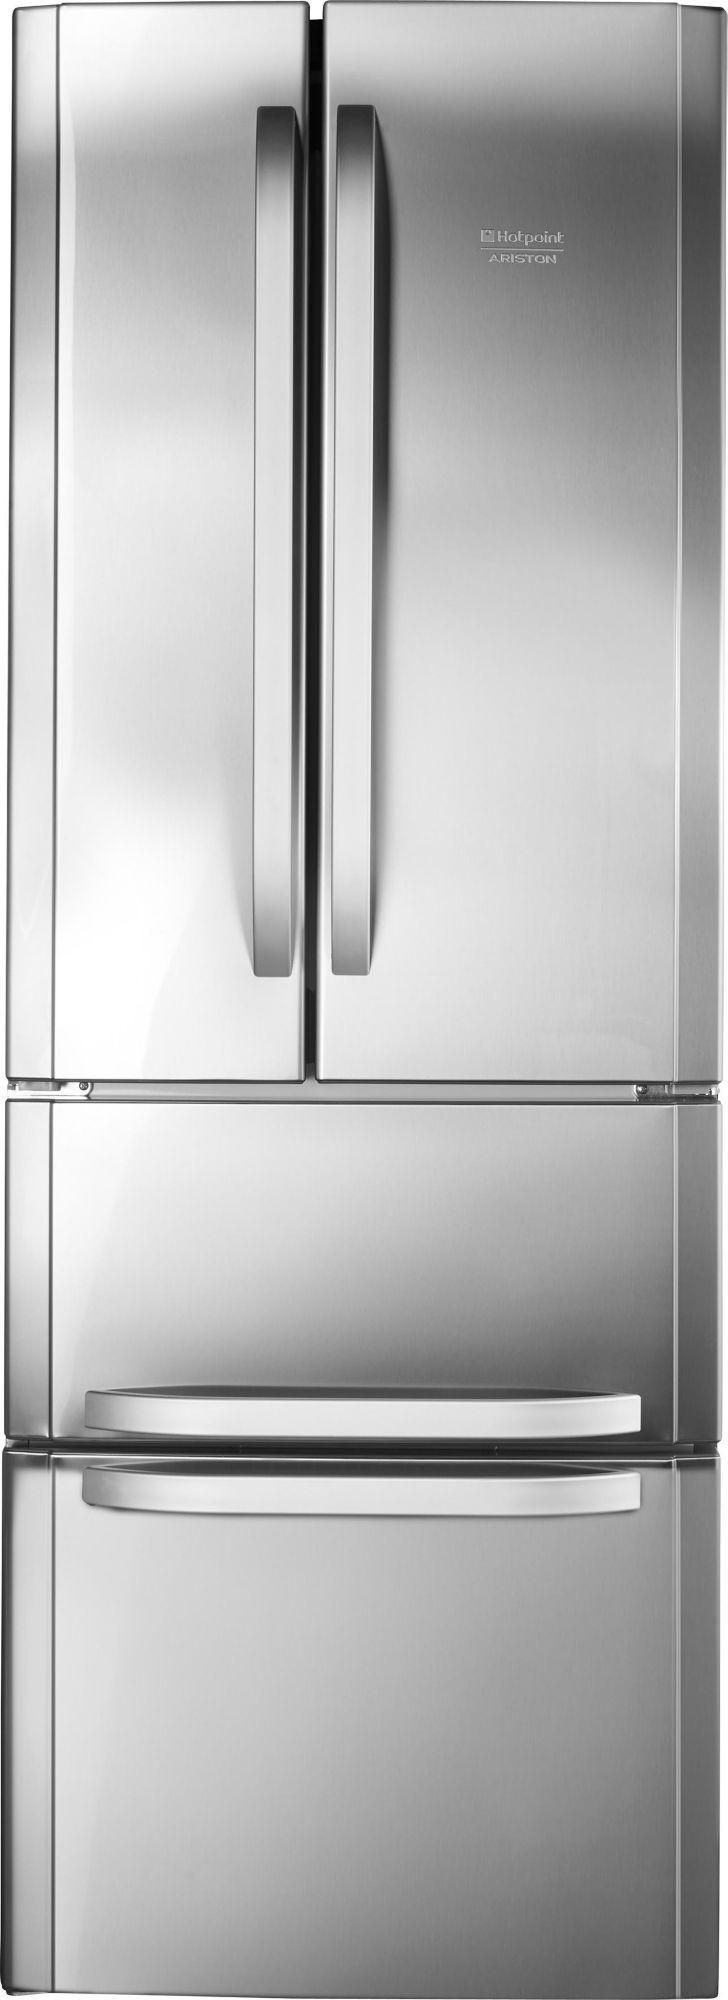 HOTPOINT Hotpoint French Door Kühlschrank E4D AAA X C, A++, 195,5 cm hoch, NoFrost